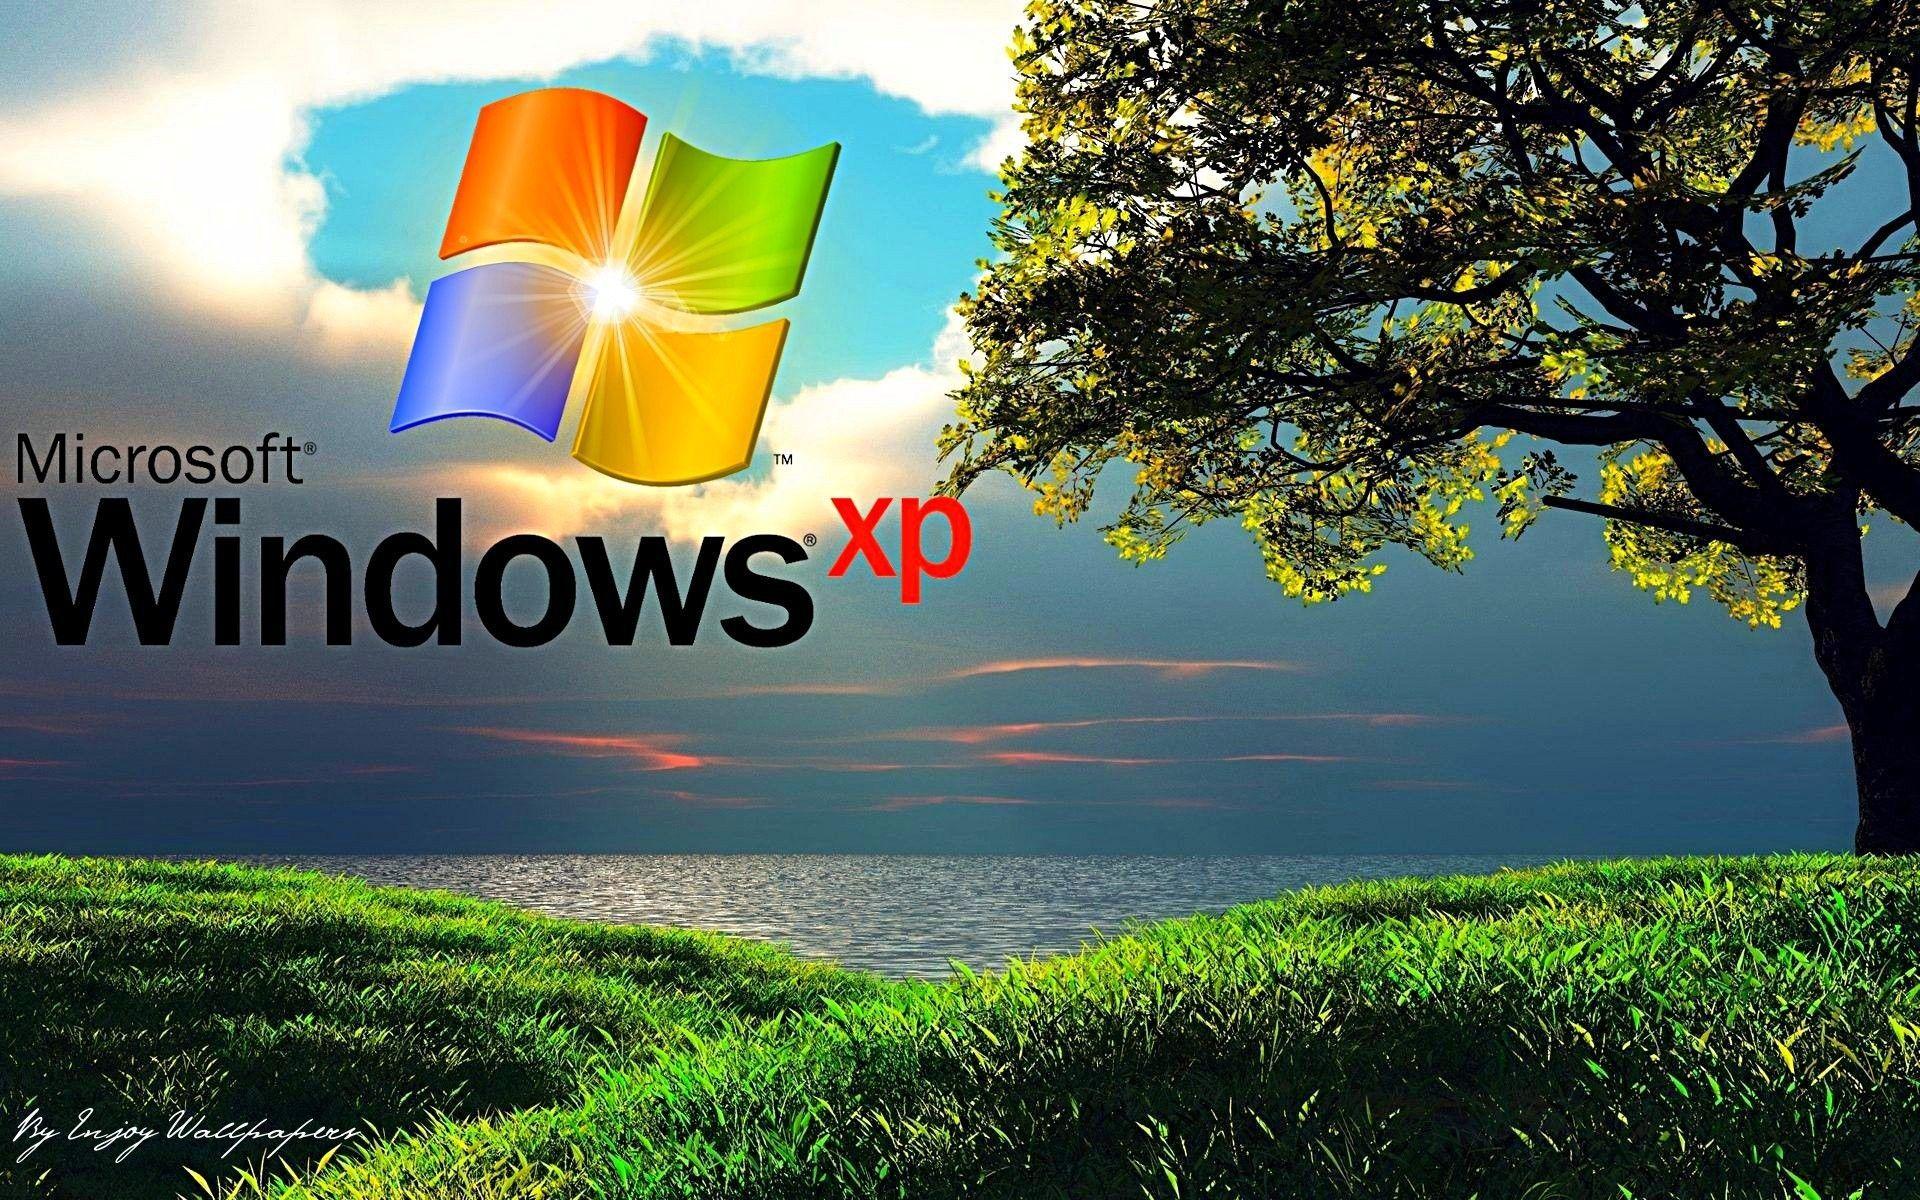 Windows Xp Wallpapers Free Download